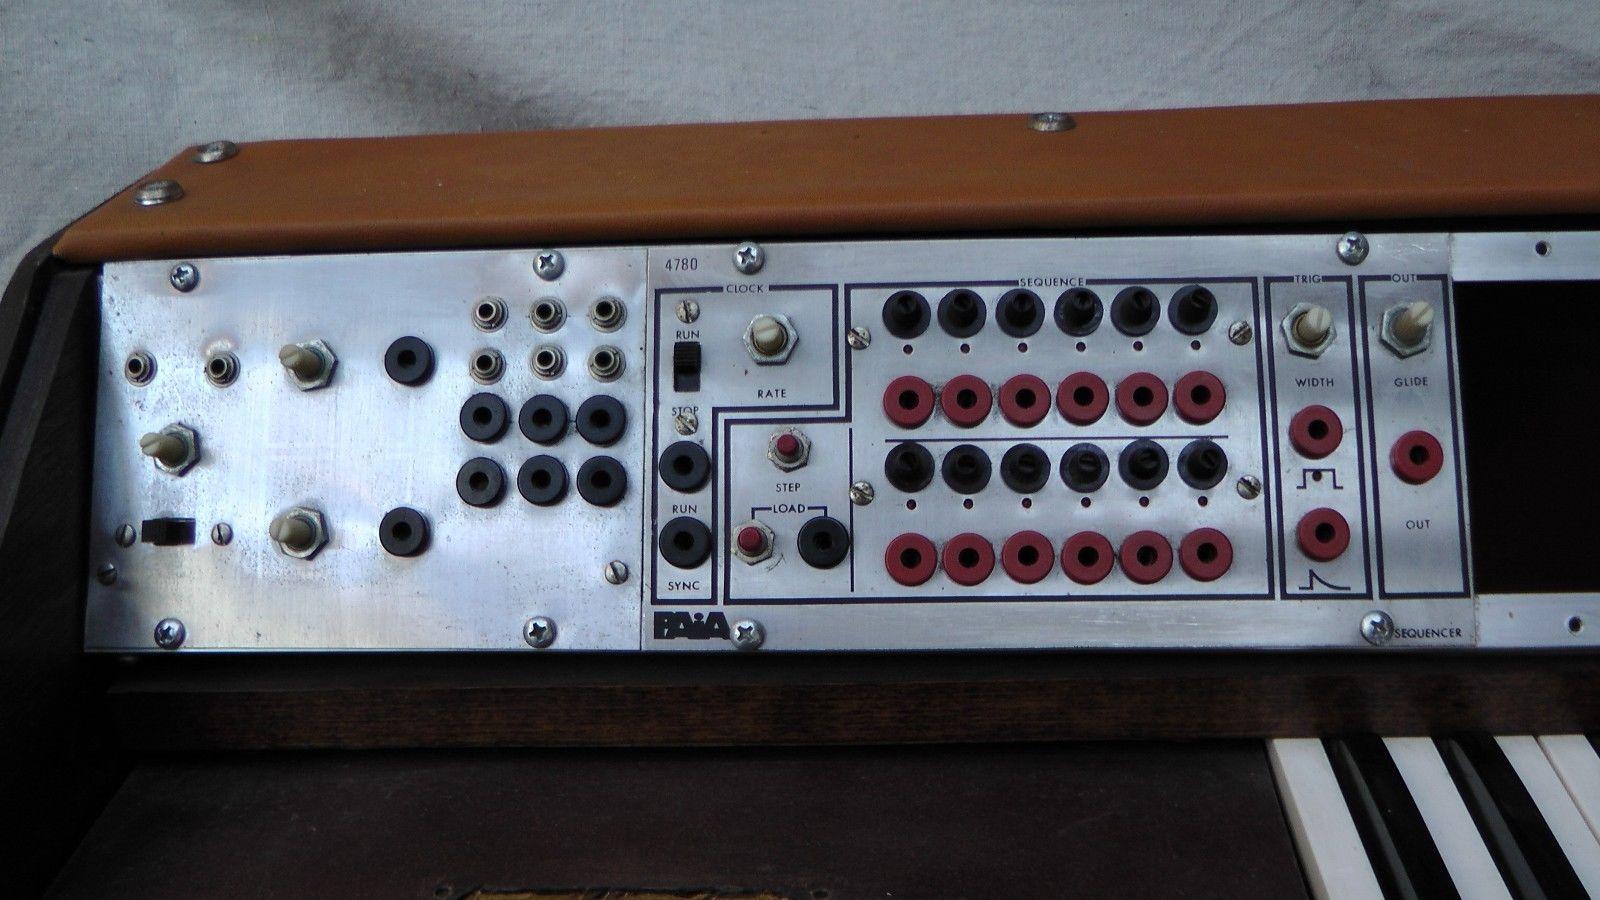 matrixsynth vintage paia modular synthesizer rack unit plus keyboard. Black Bedroom Furniture Sets. Home Design Ideas